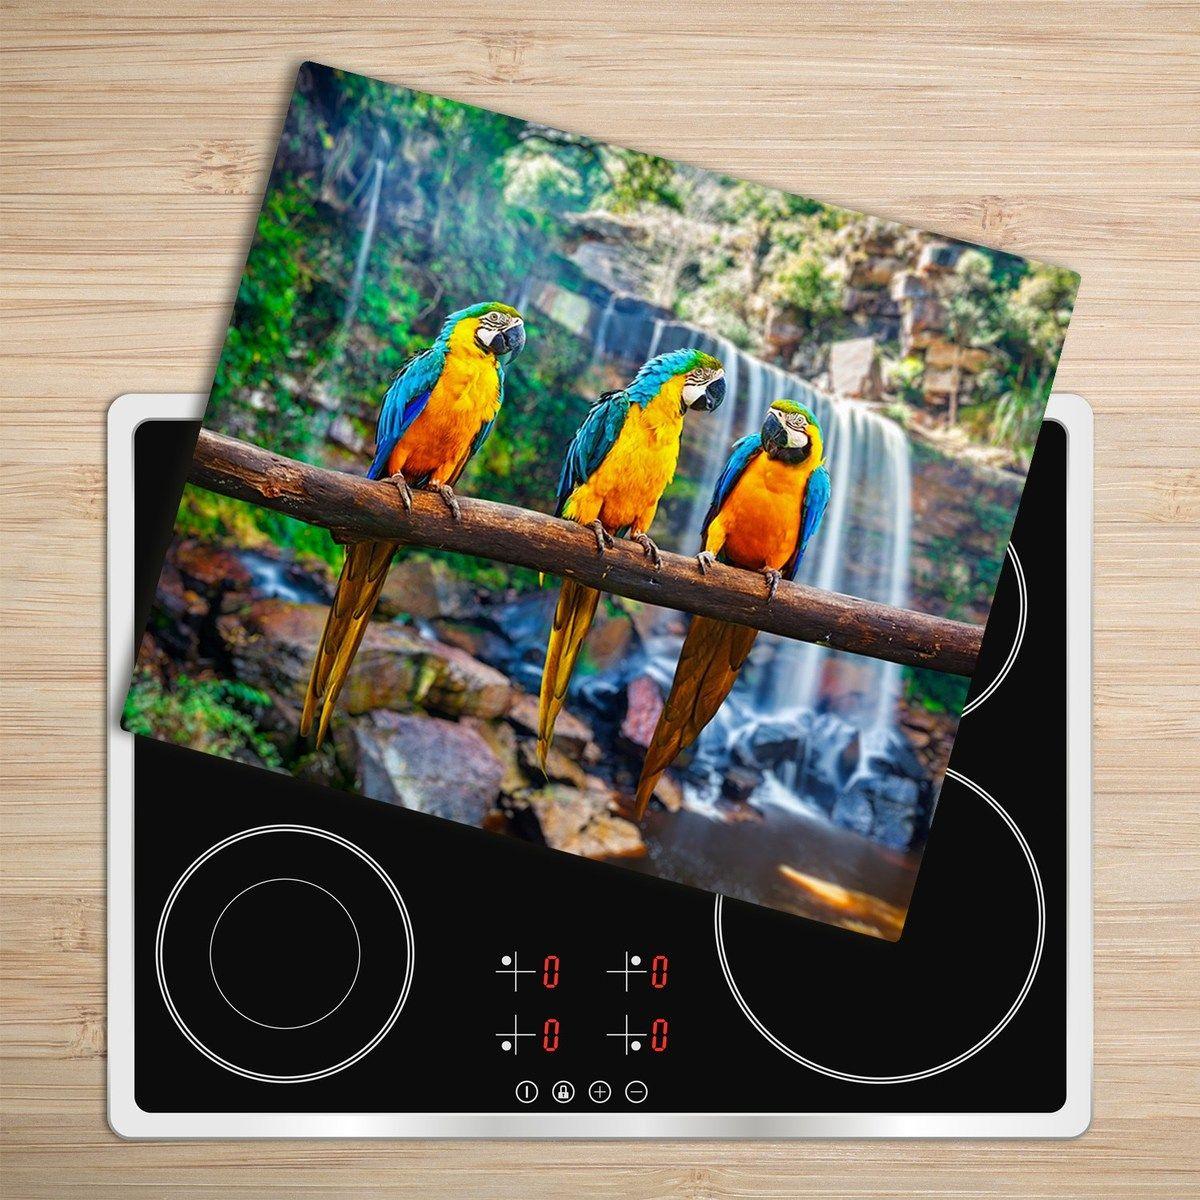 #kitchen #kitchenboard #choppingboard #glass #glassart #colors #colorful #animaplattern #parrots #jungle #jungalow #urbanjungle #stayhome #homemakeover #kitchendecor #kitchendesign #moderndecor